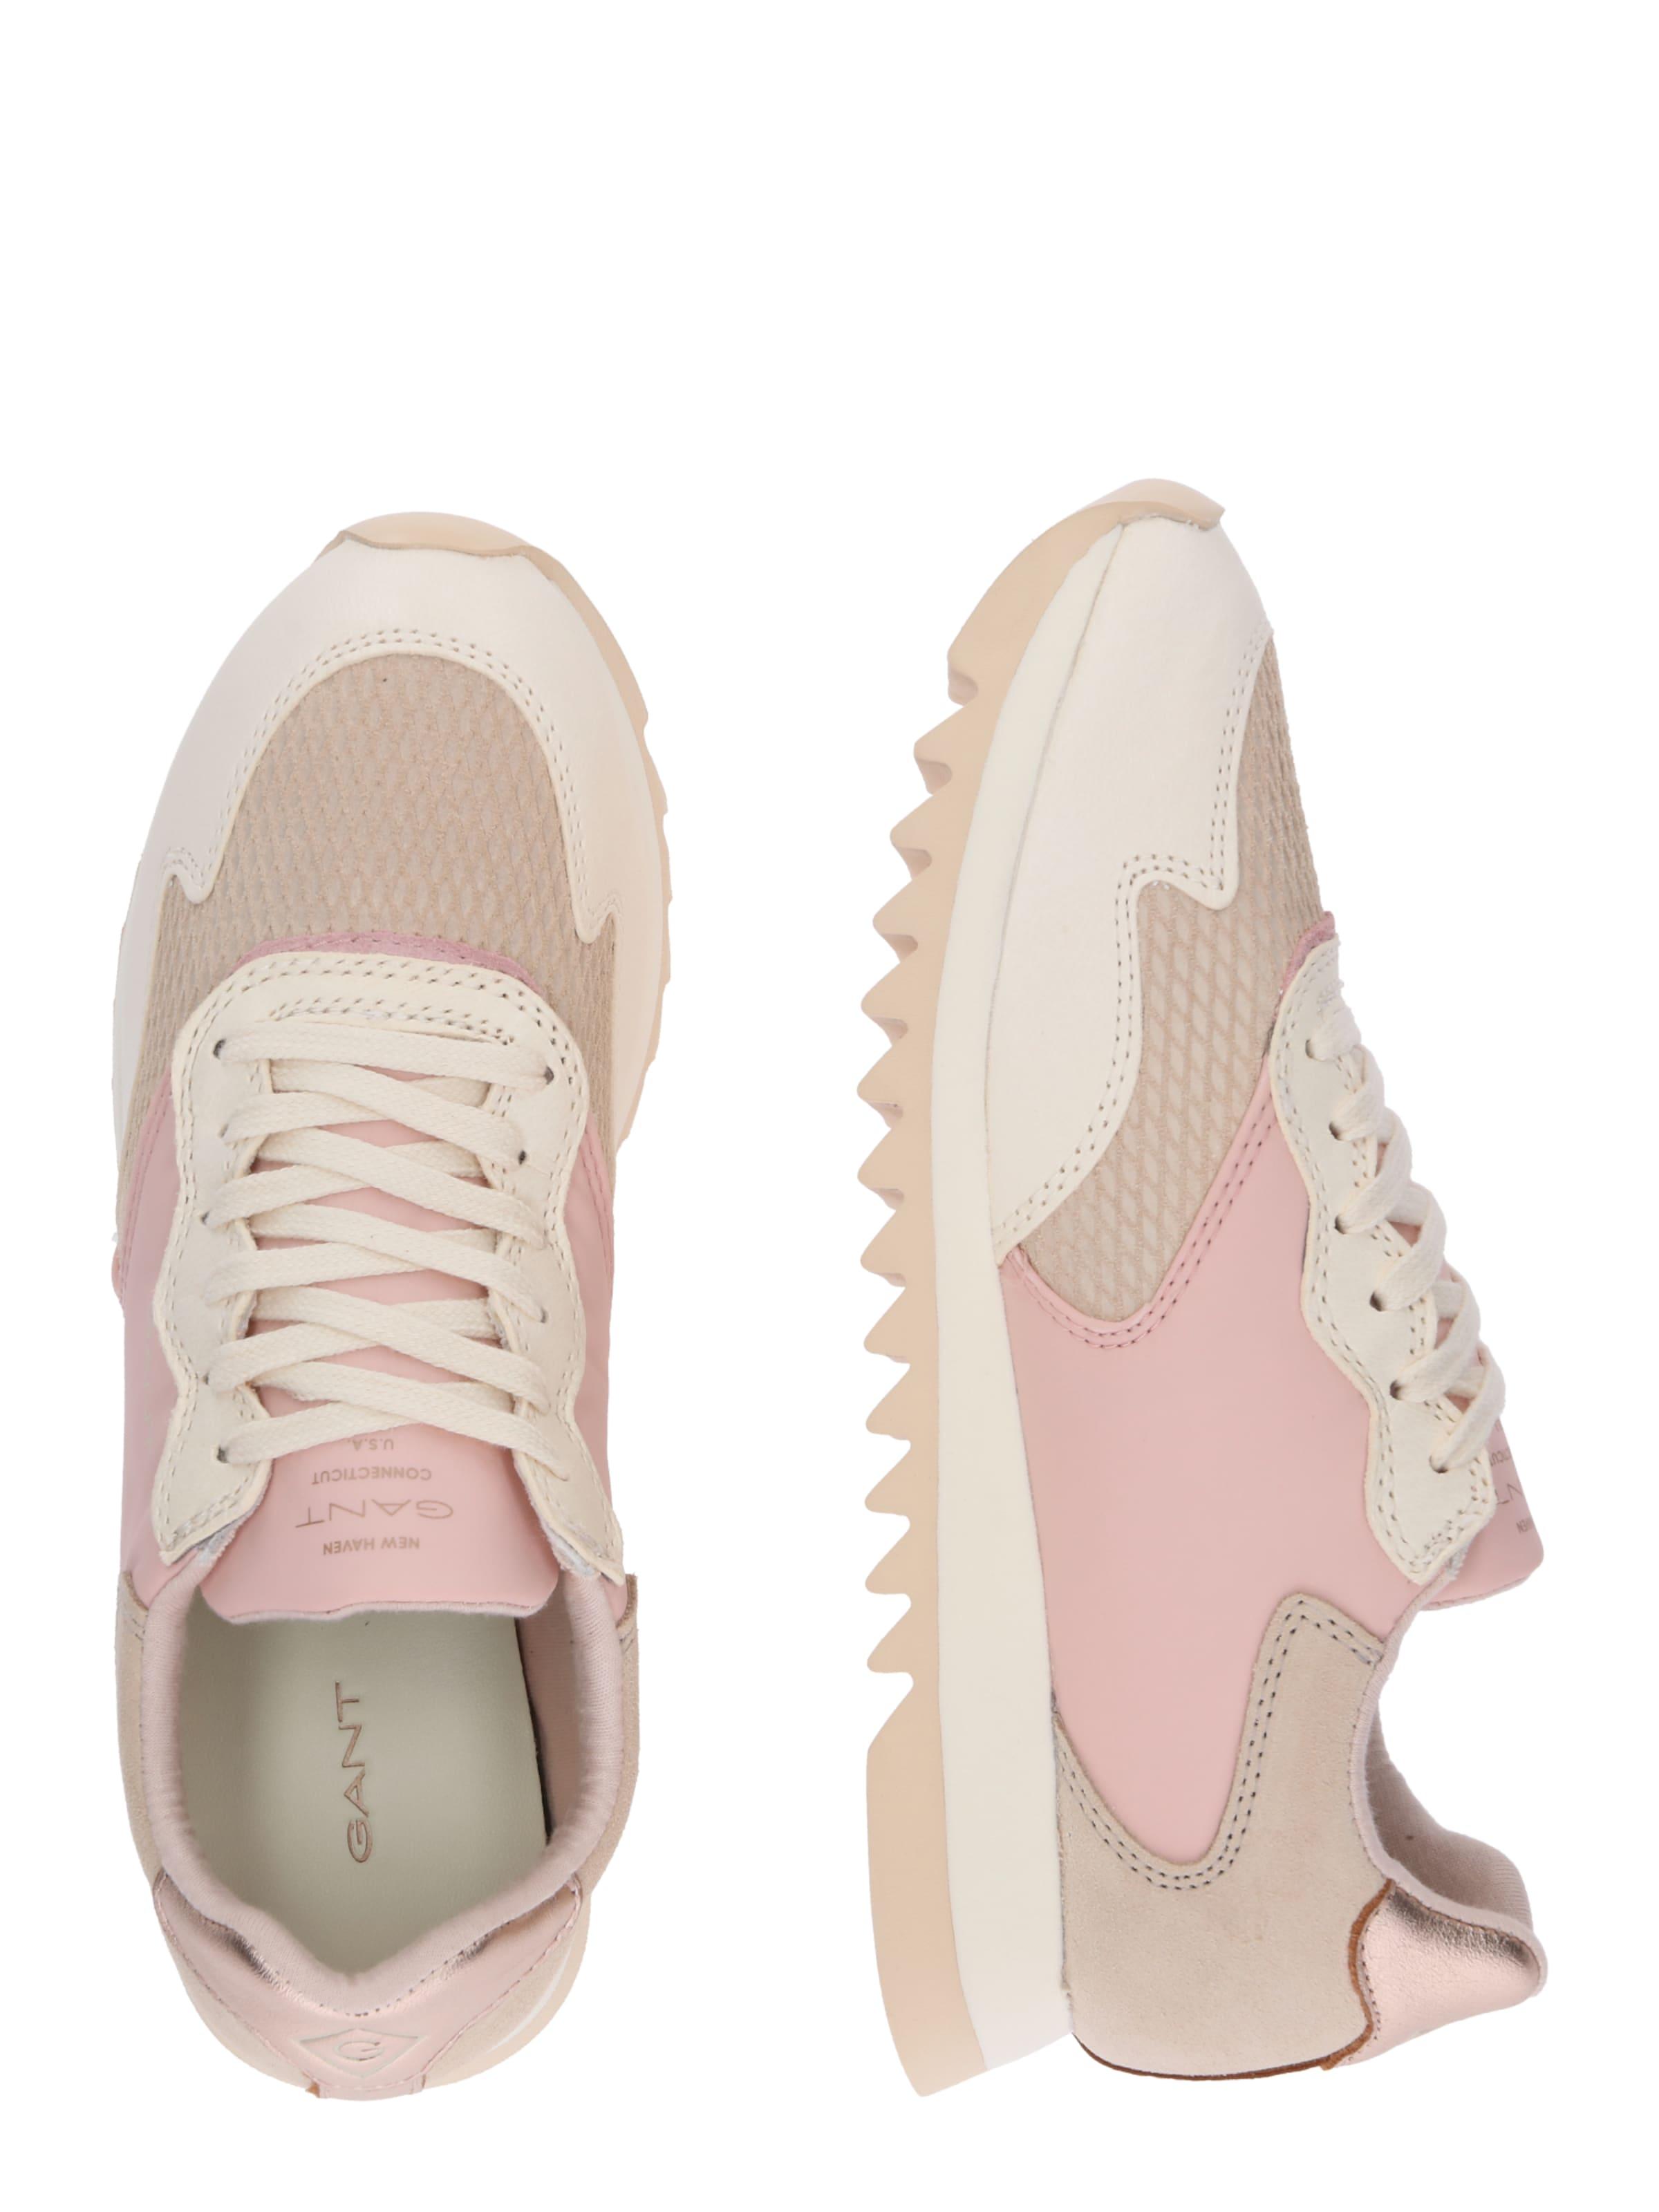 Rosa In Gant Sneakers Laag 0ow8nmnv Lindsey' m8wOvN0n